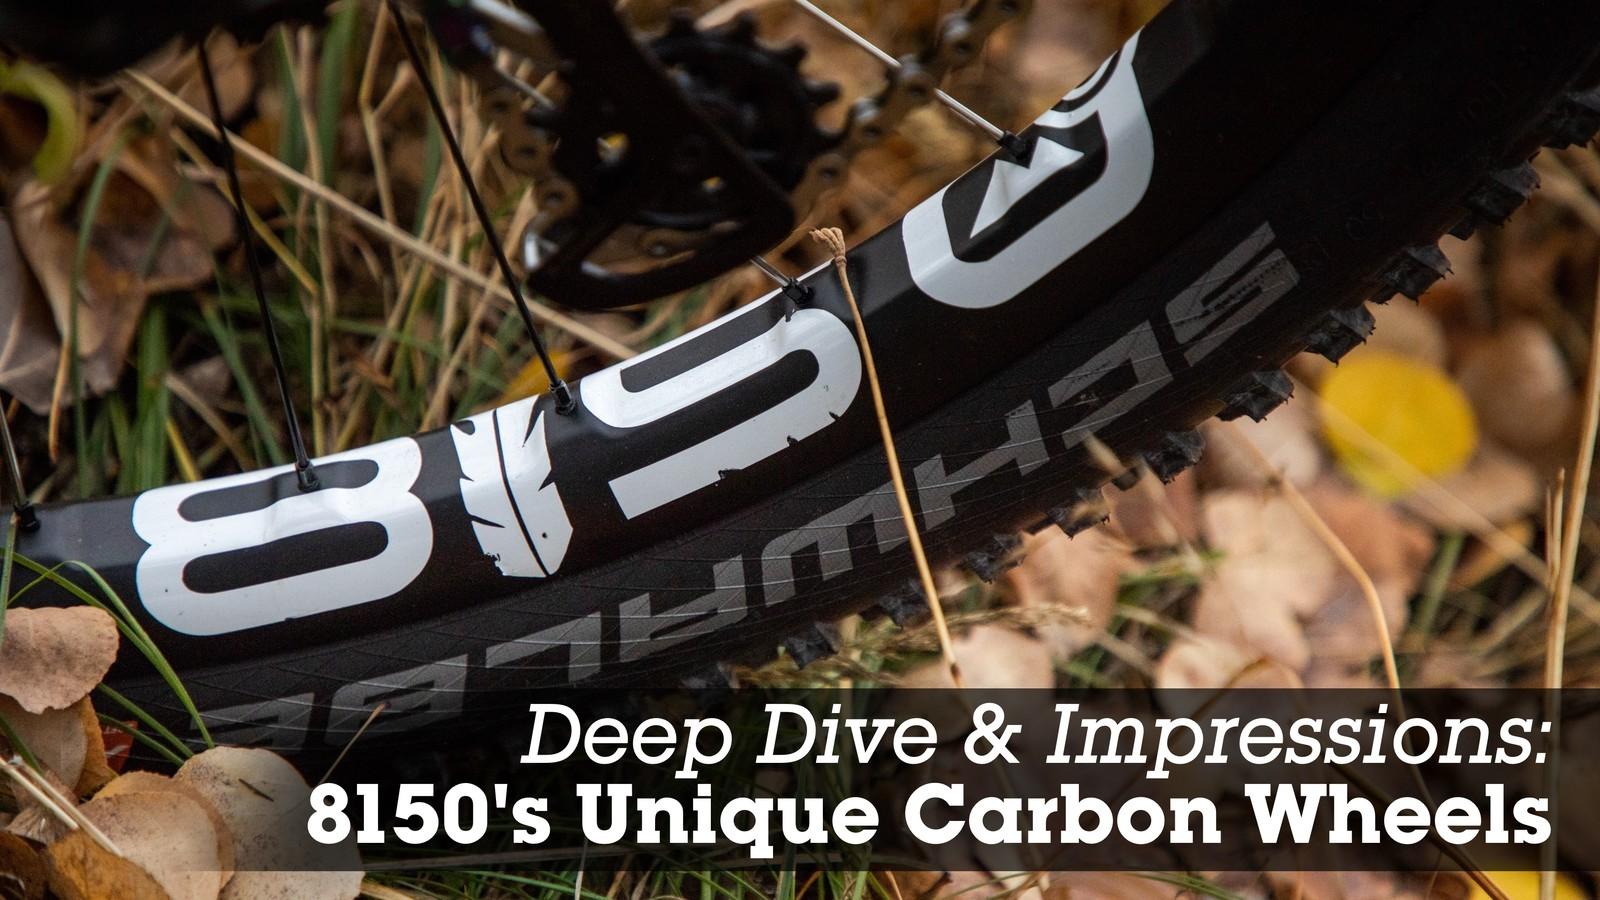 Deep Dive and Impressions: 8150's Unique Carbon Wheels